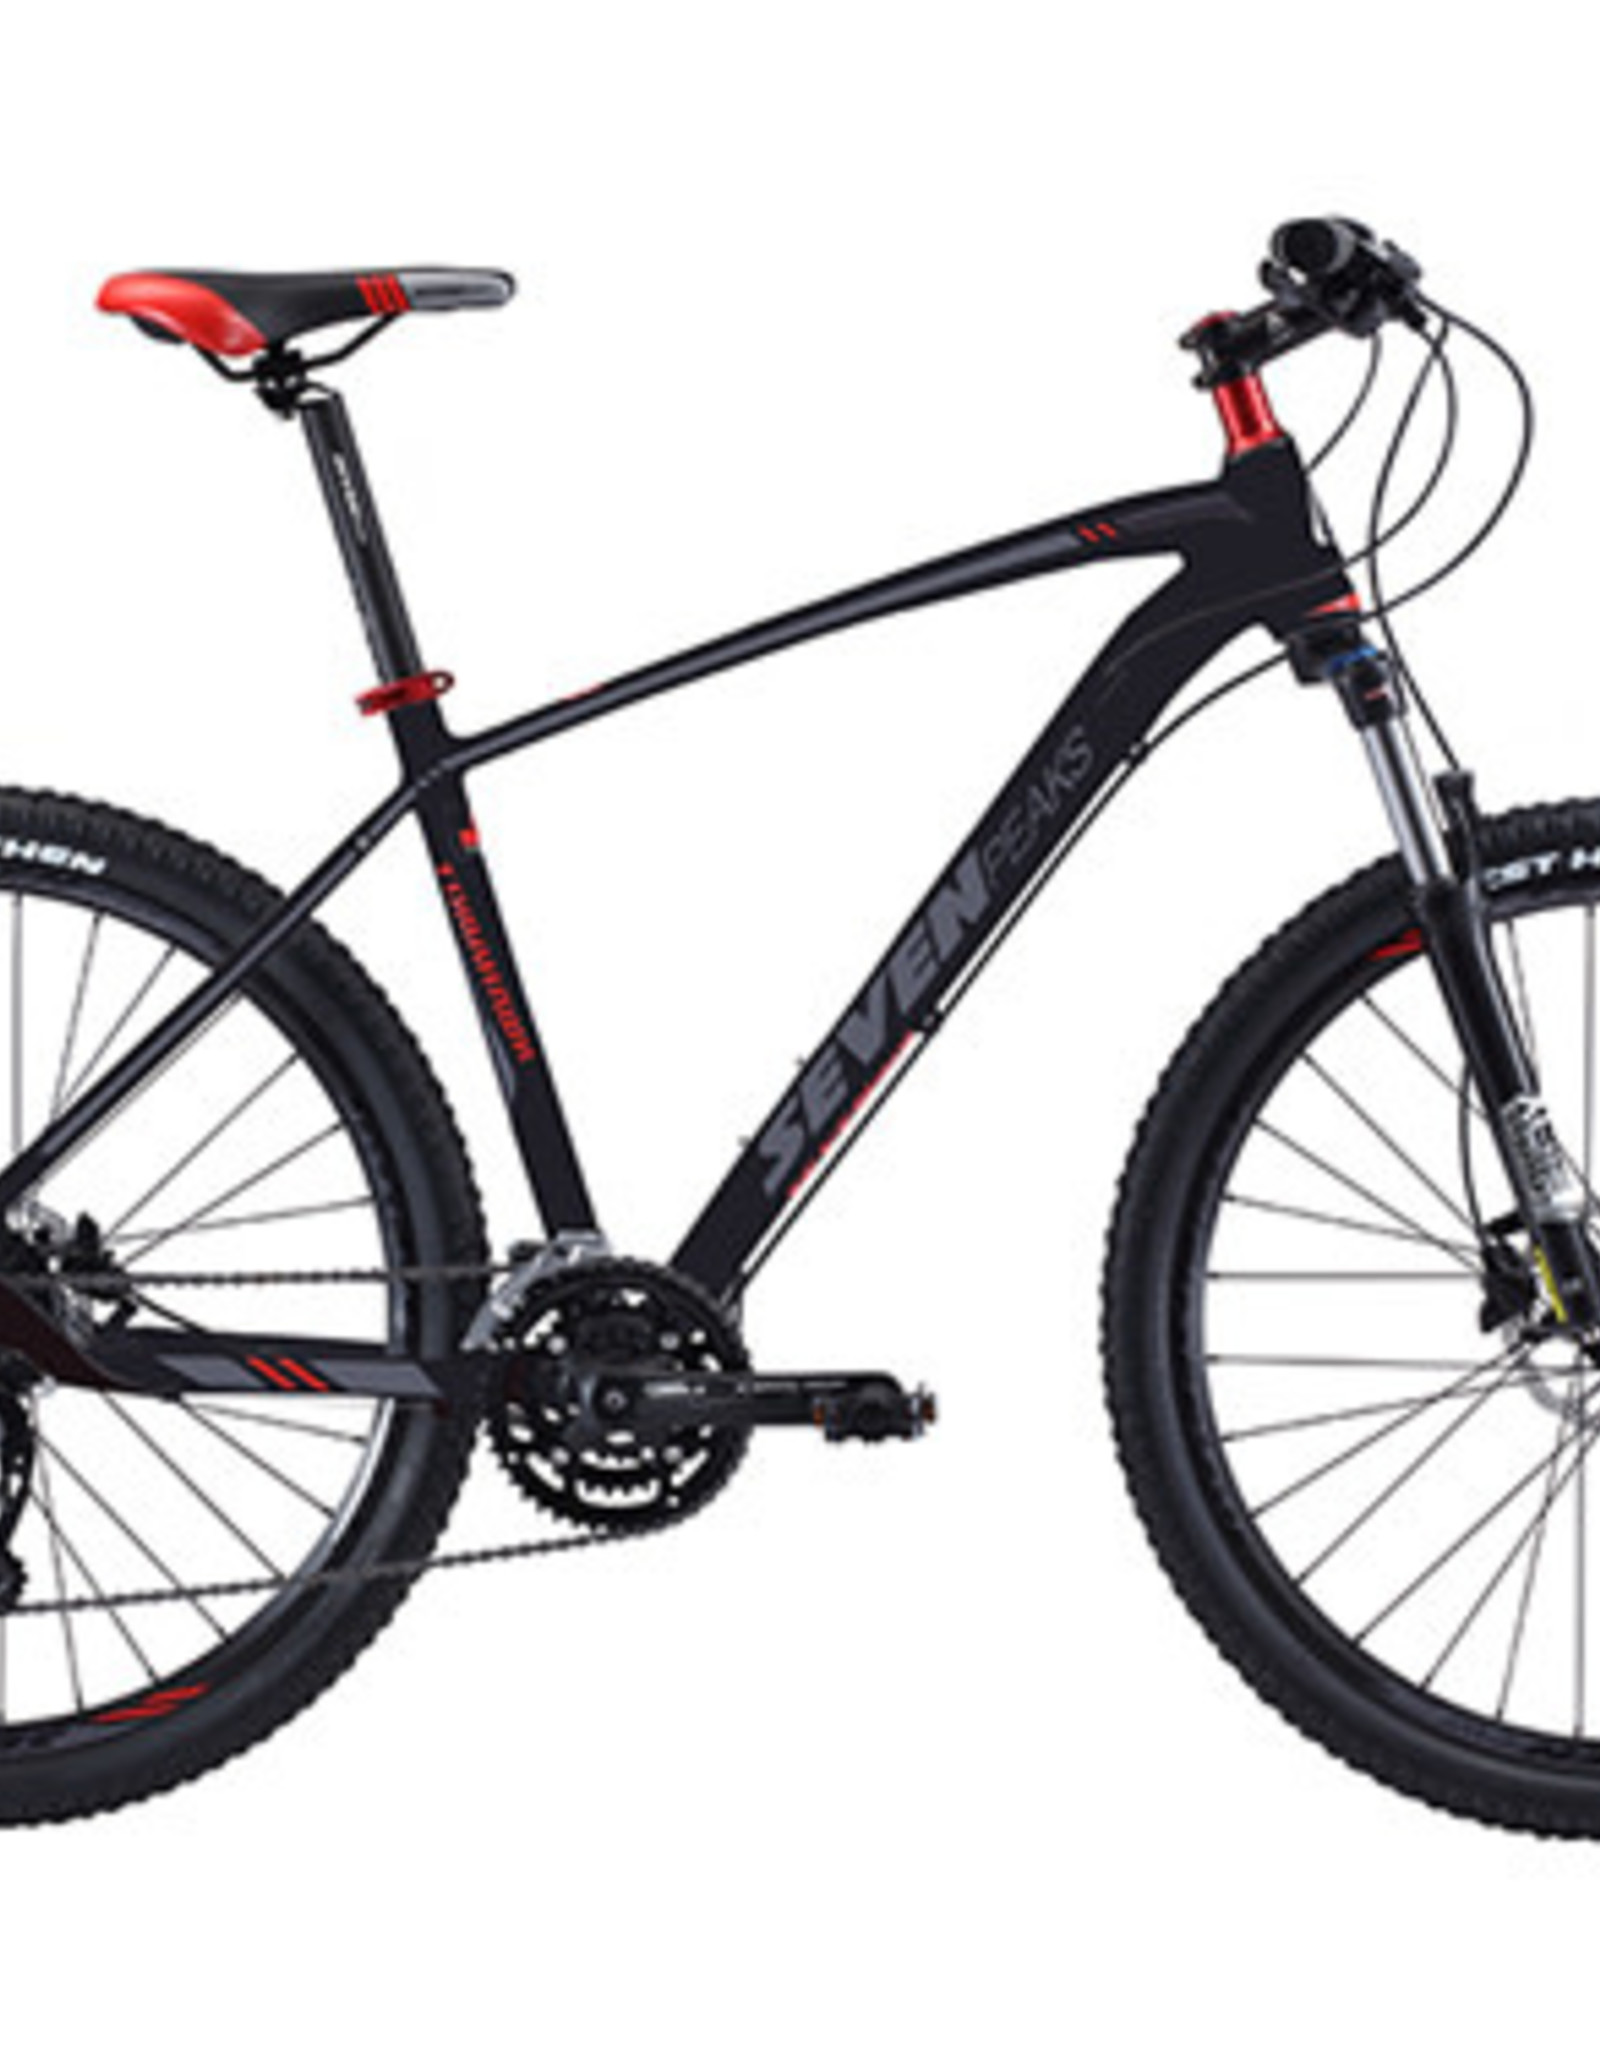 Seven Paeks Vélo Tomahawk (19) 27v 27.5'' BLK/RD vsp